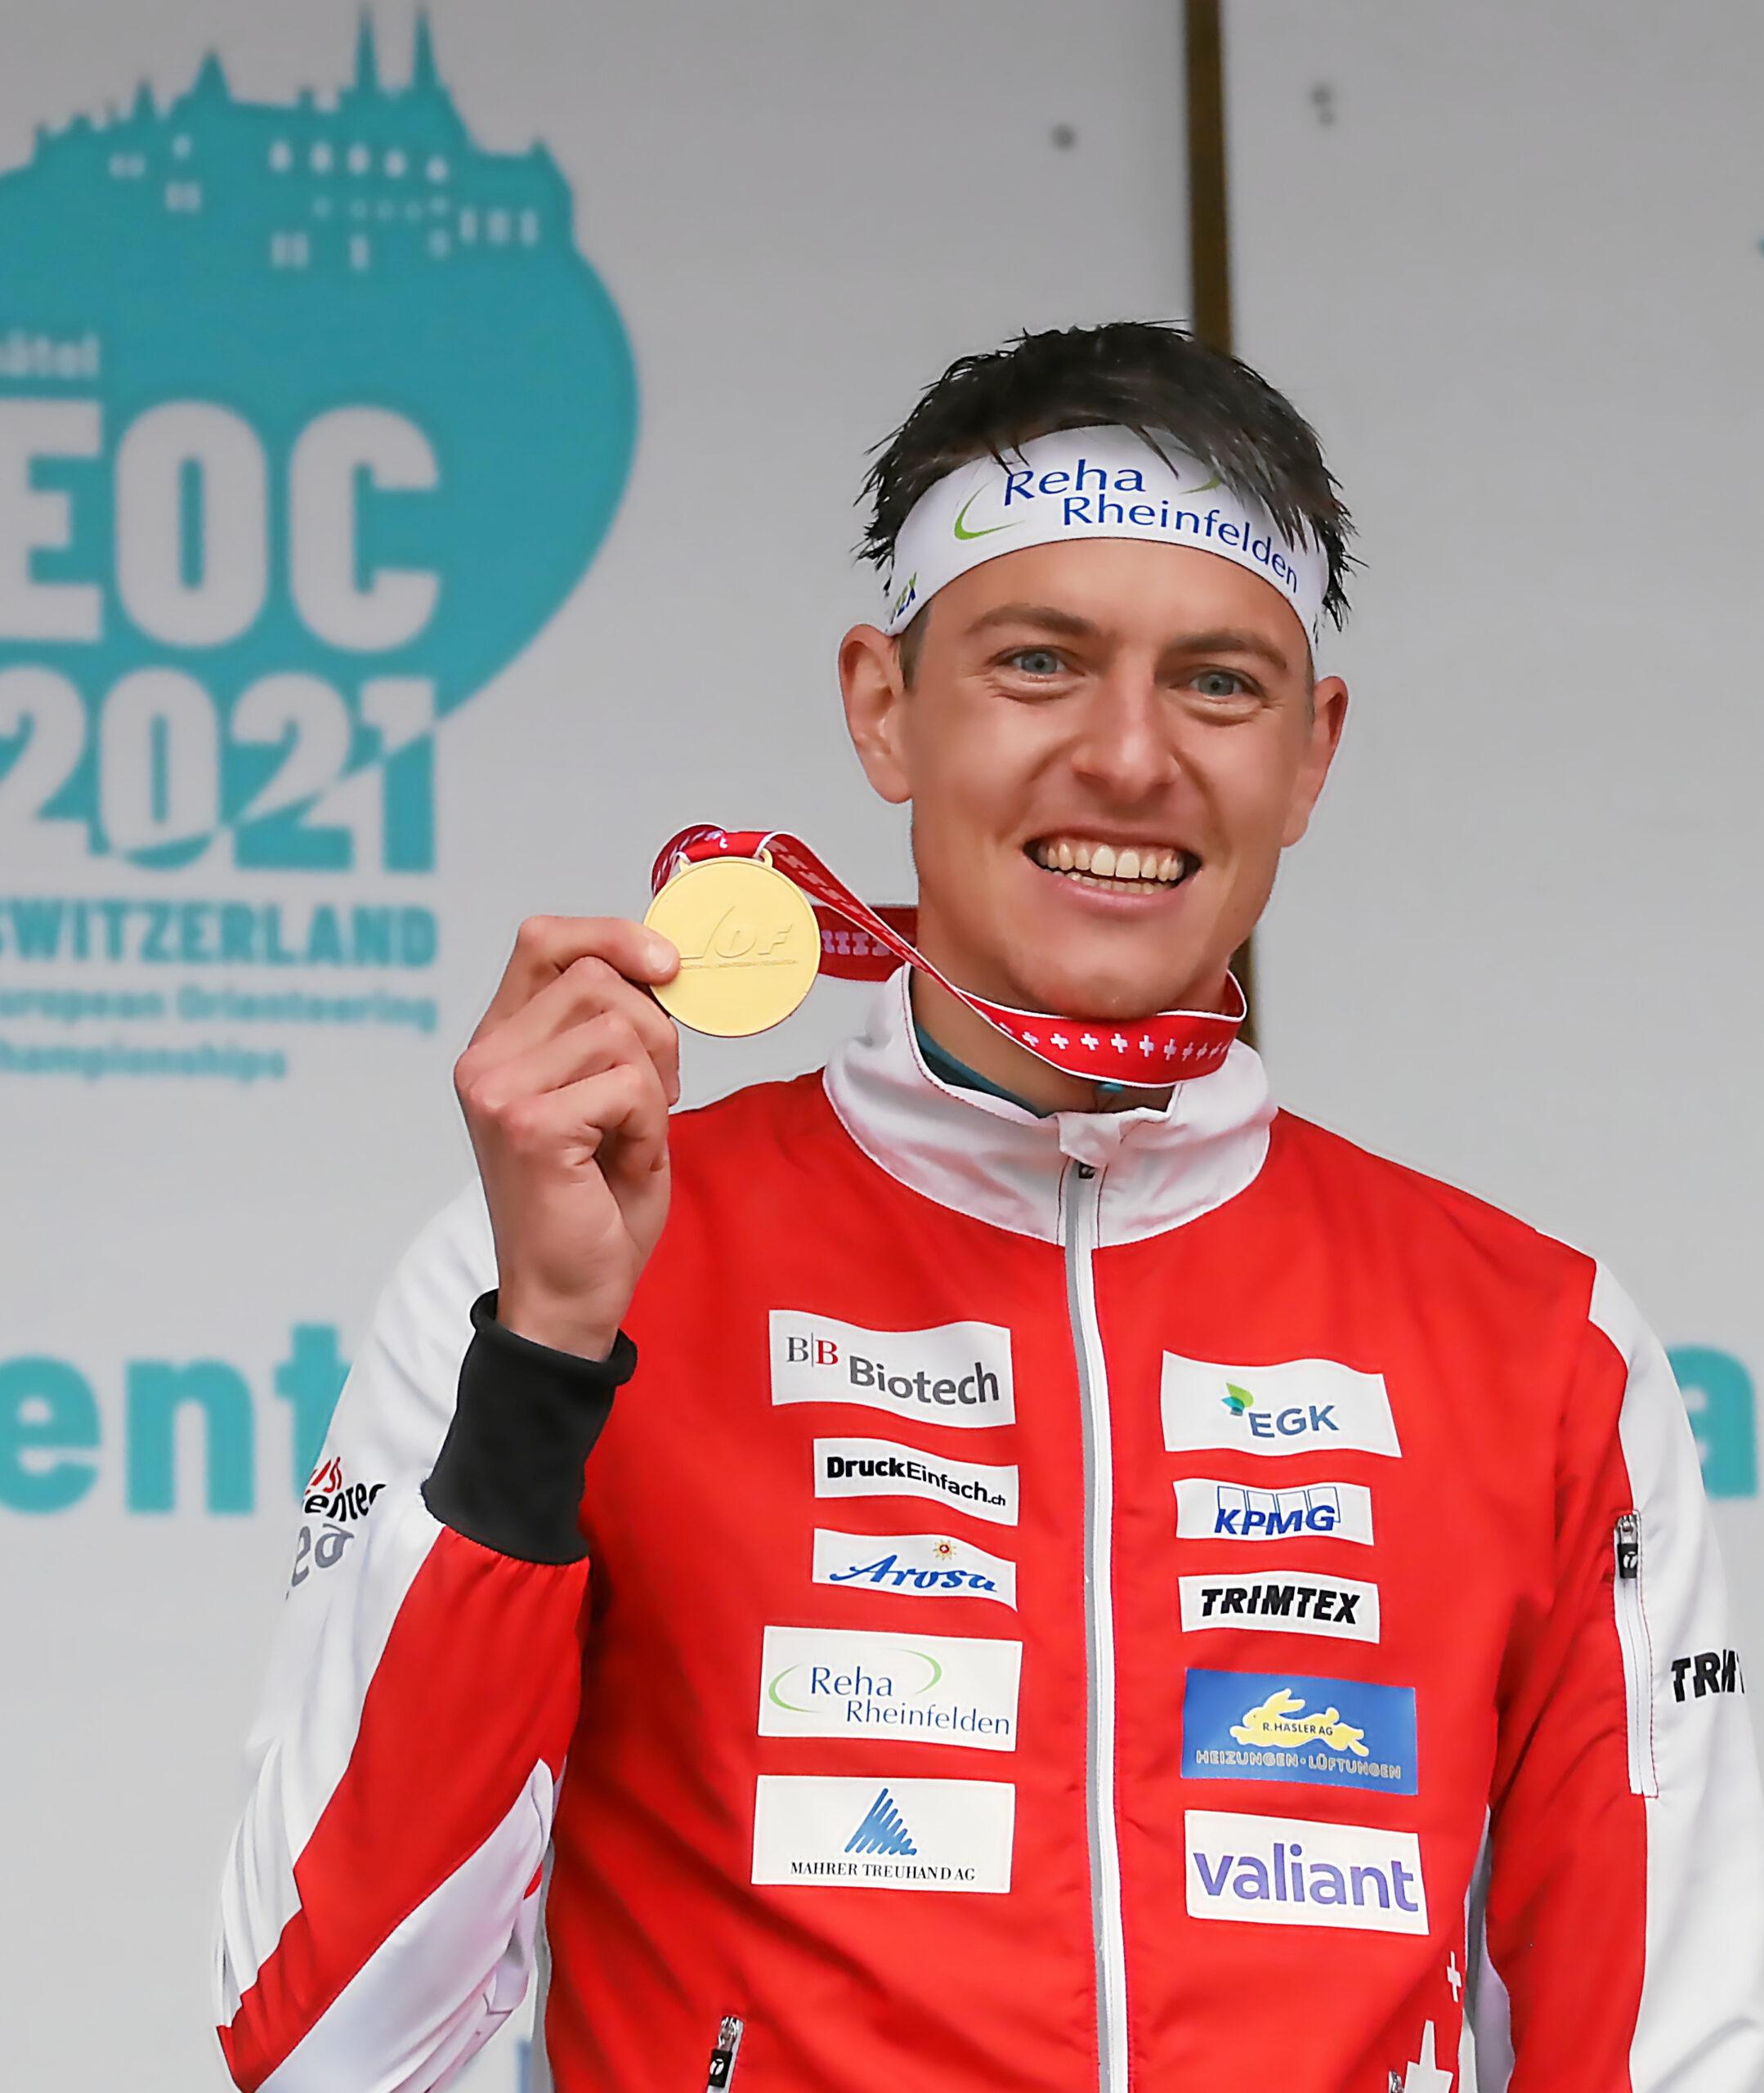 EOC 2021: KO Sprint Finals – Award Ceremonies – European Champion Matthias Kyburz